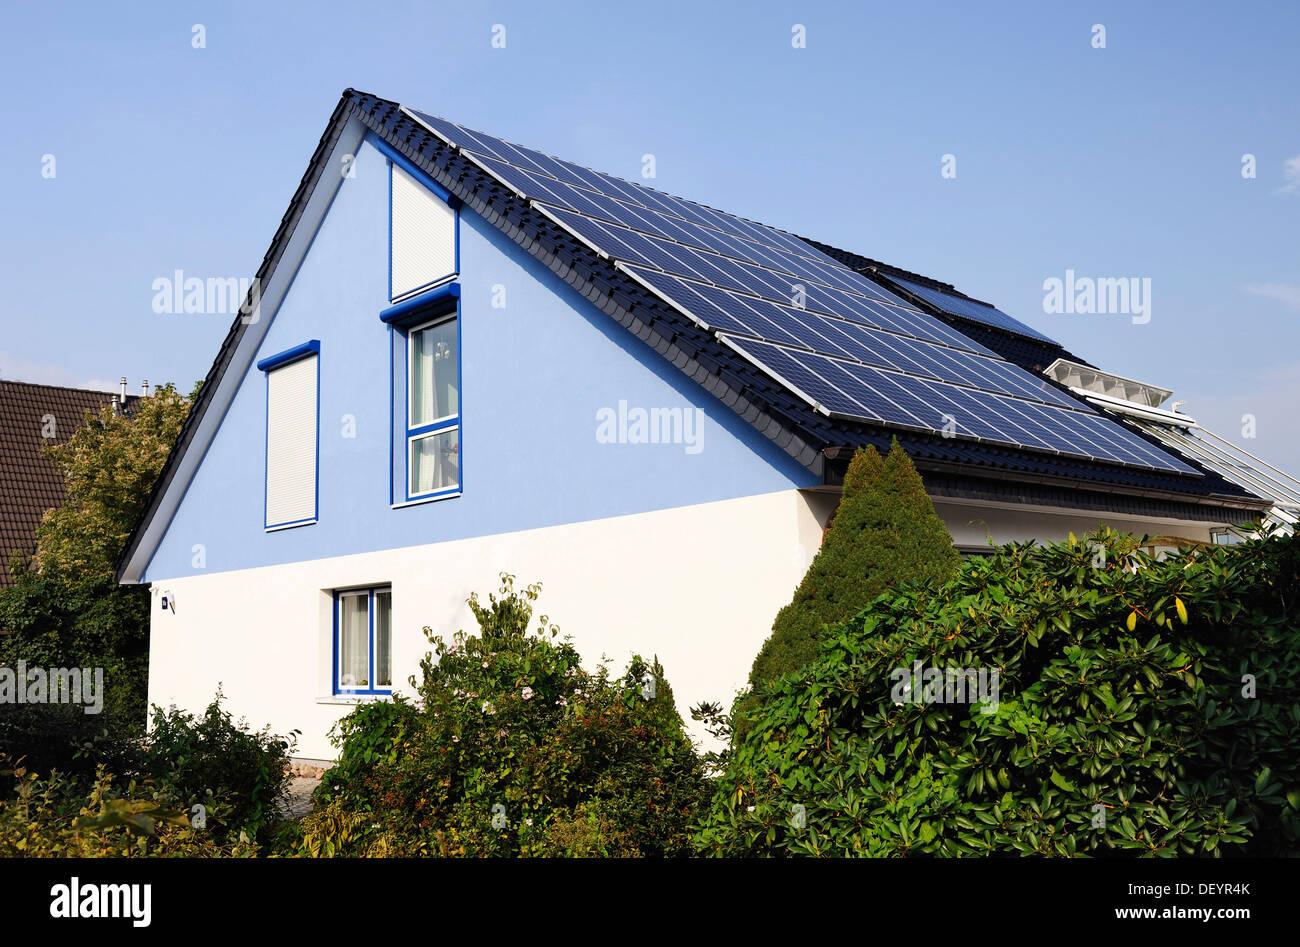 Solar Panels On Roof Houses Stock Photos Amp Solar Panels On